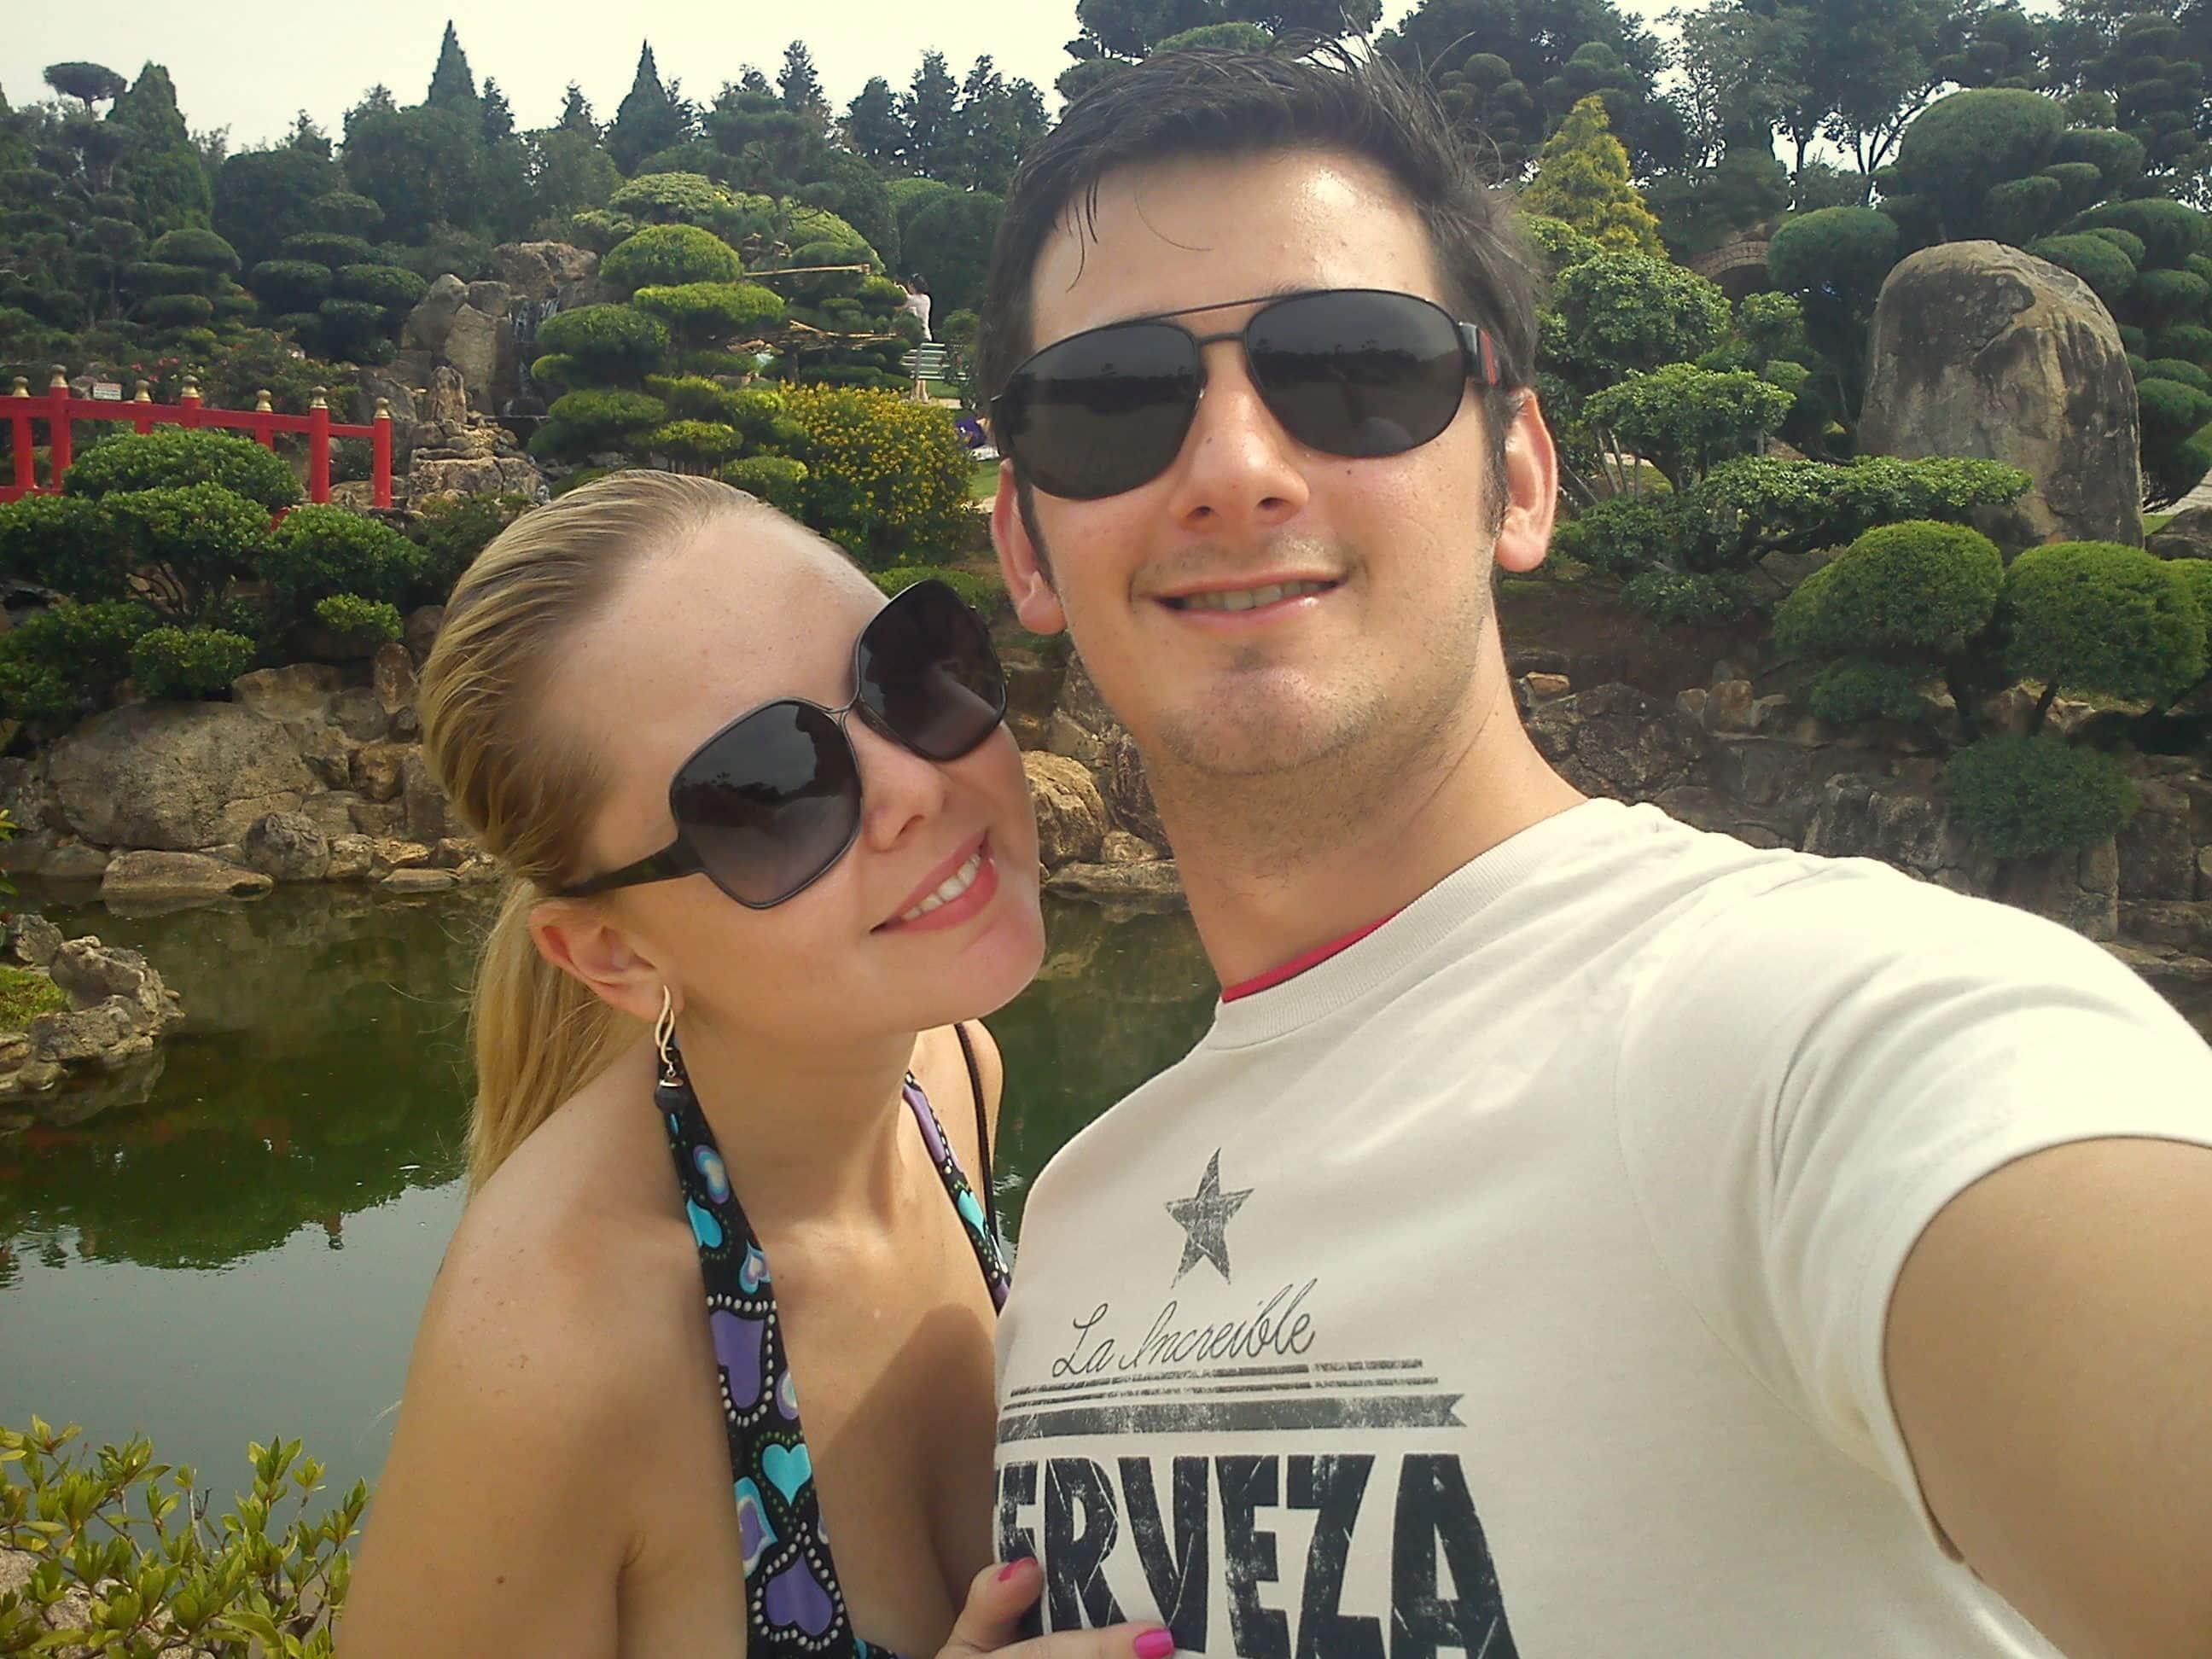 namoro à distância Jardim Japonês Pousada Maeda Itu